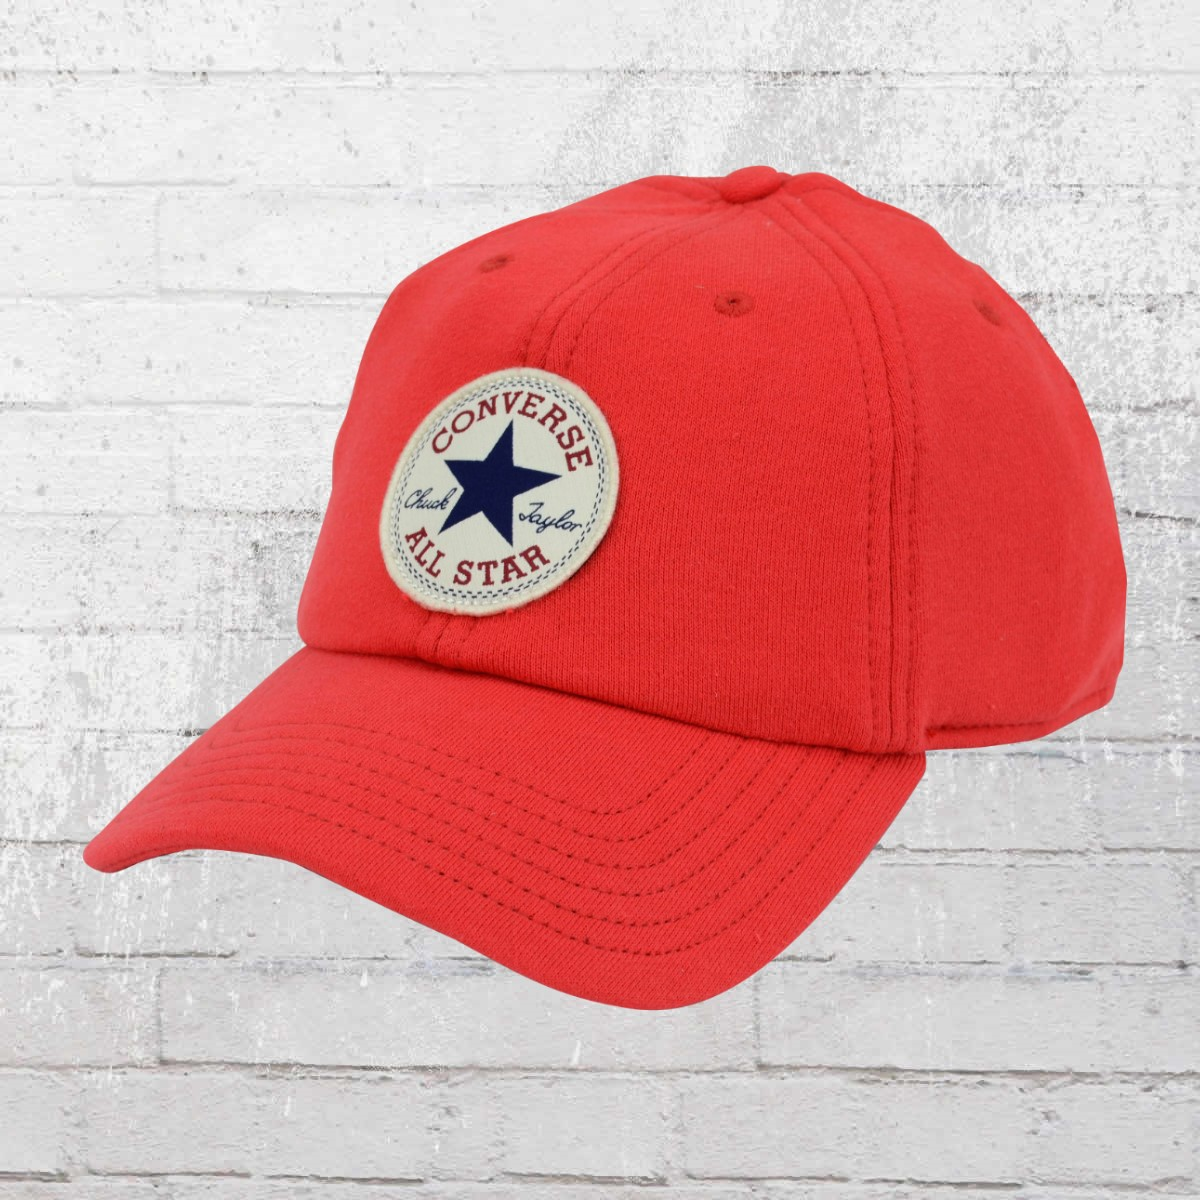 9fde4aa1 Order now | Converse Hat Lightweight Fleece Precurved Sweathsirt Cap red